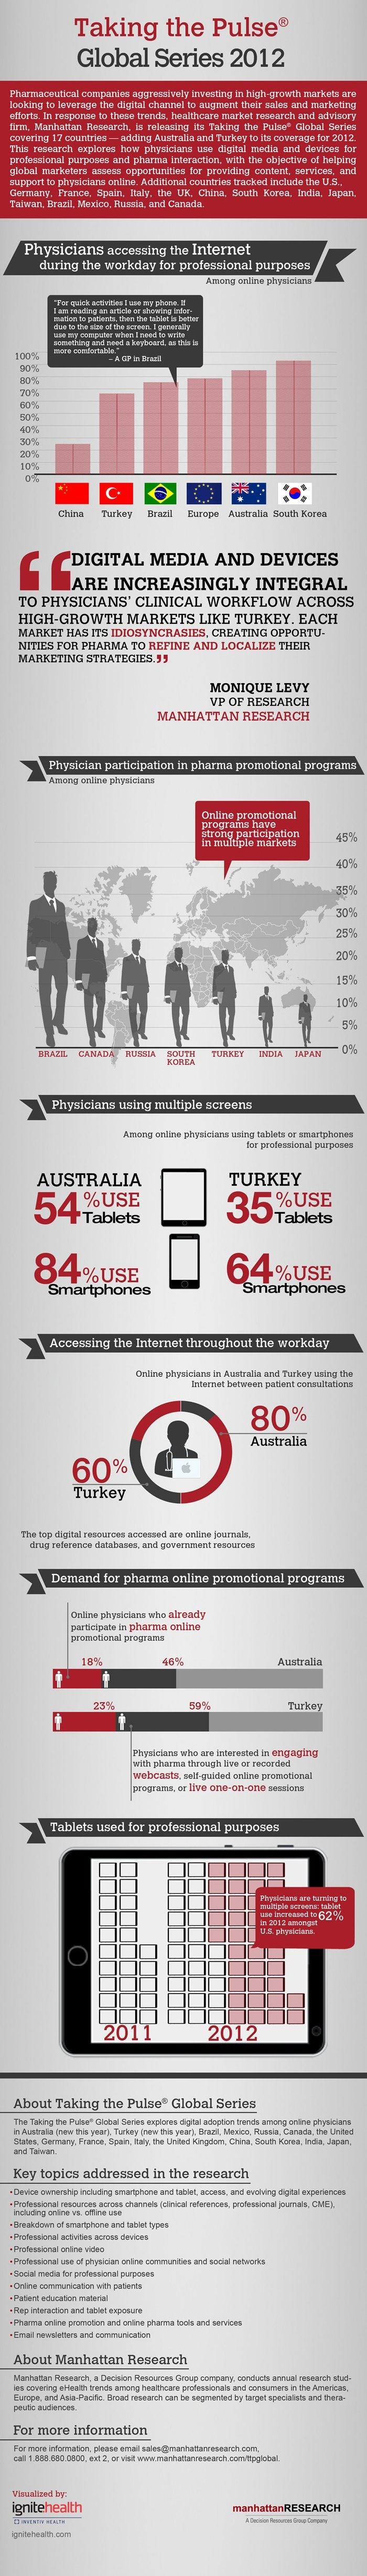 Digital Doctors Global Dashboard 2012 - Manhattan Research